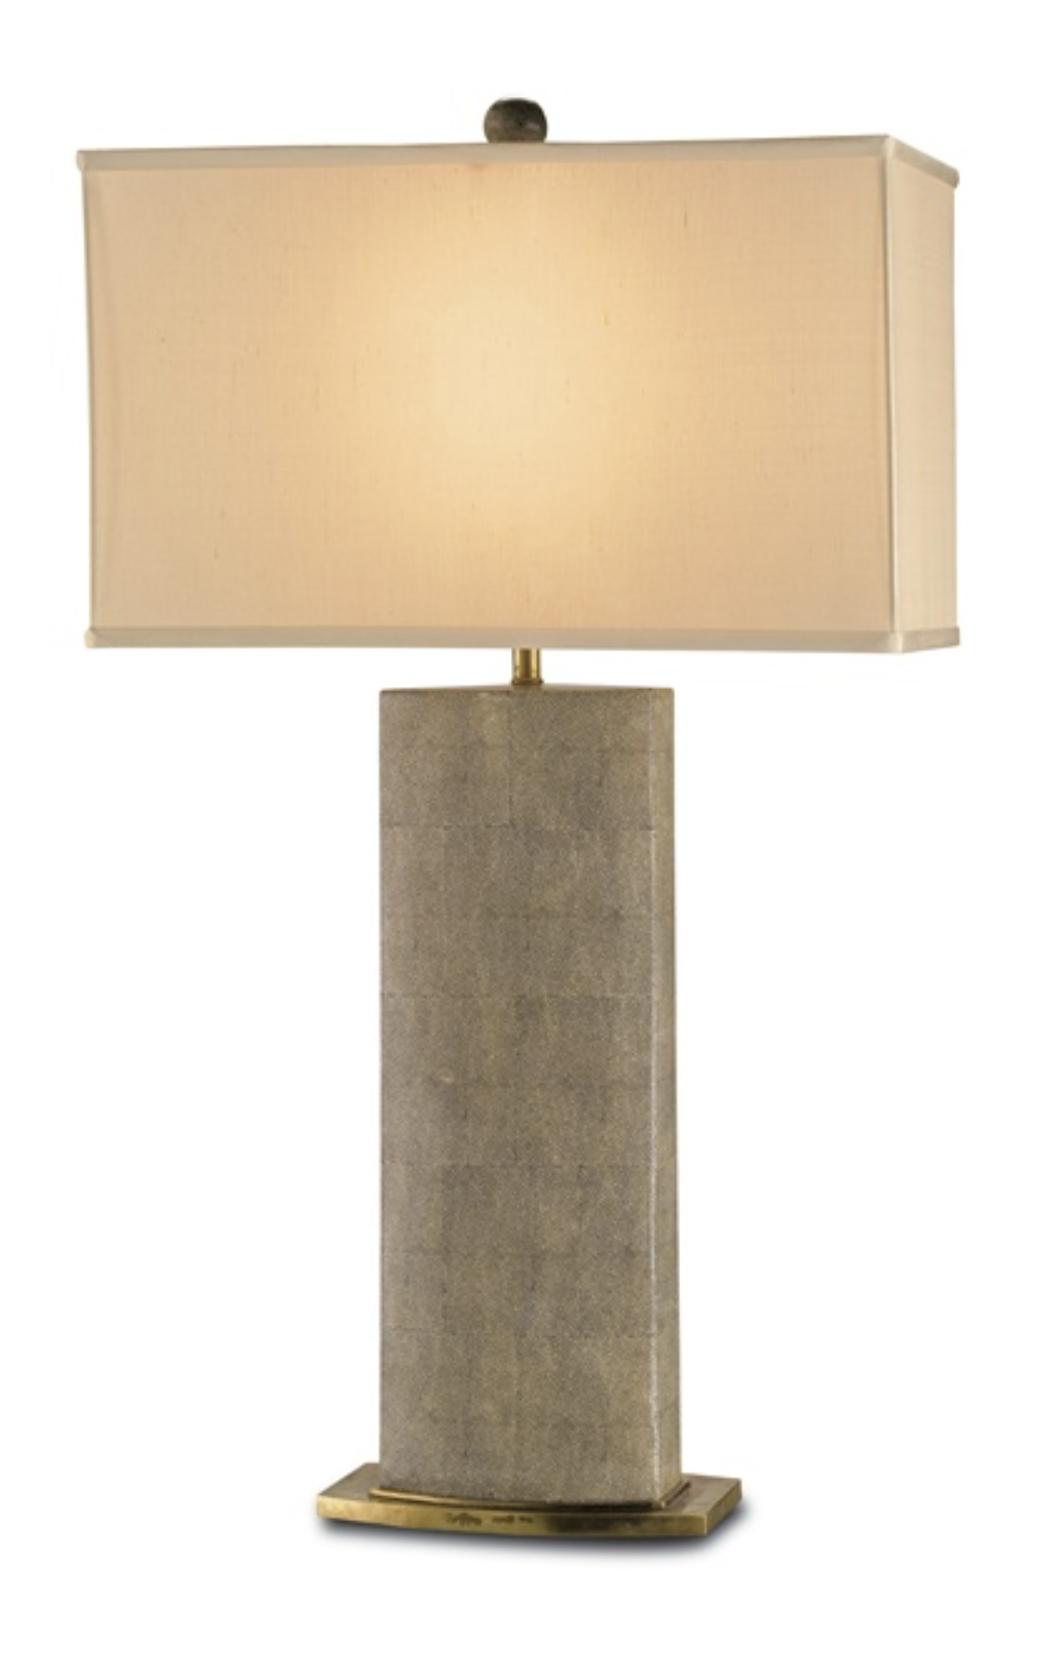 Shagreen Pattern Porcelain/Brass Table Lamp w/Silk Shade  19x10x33h  CC6355